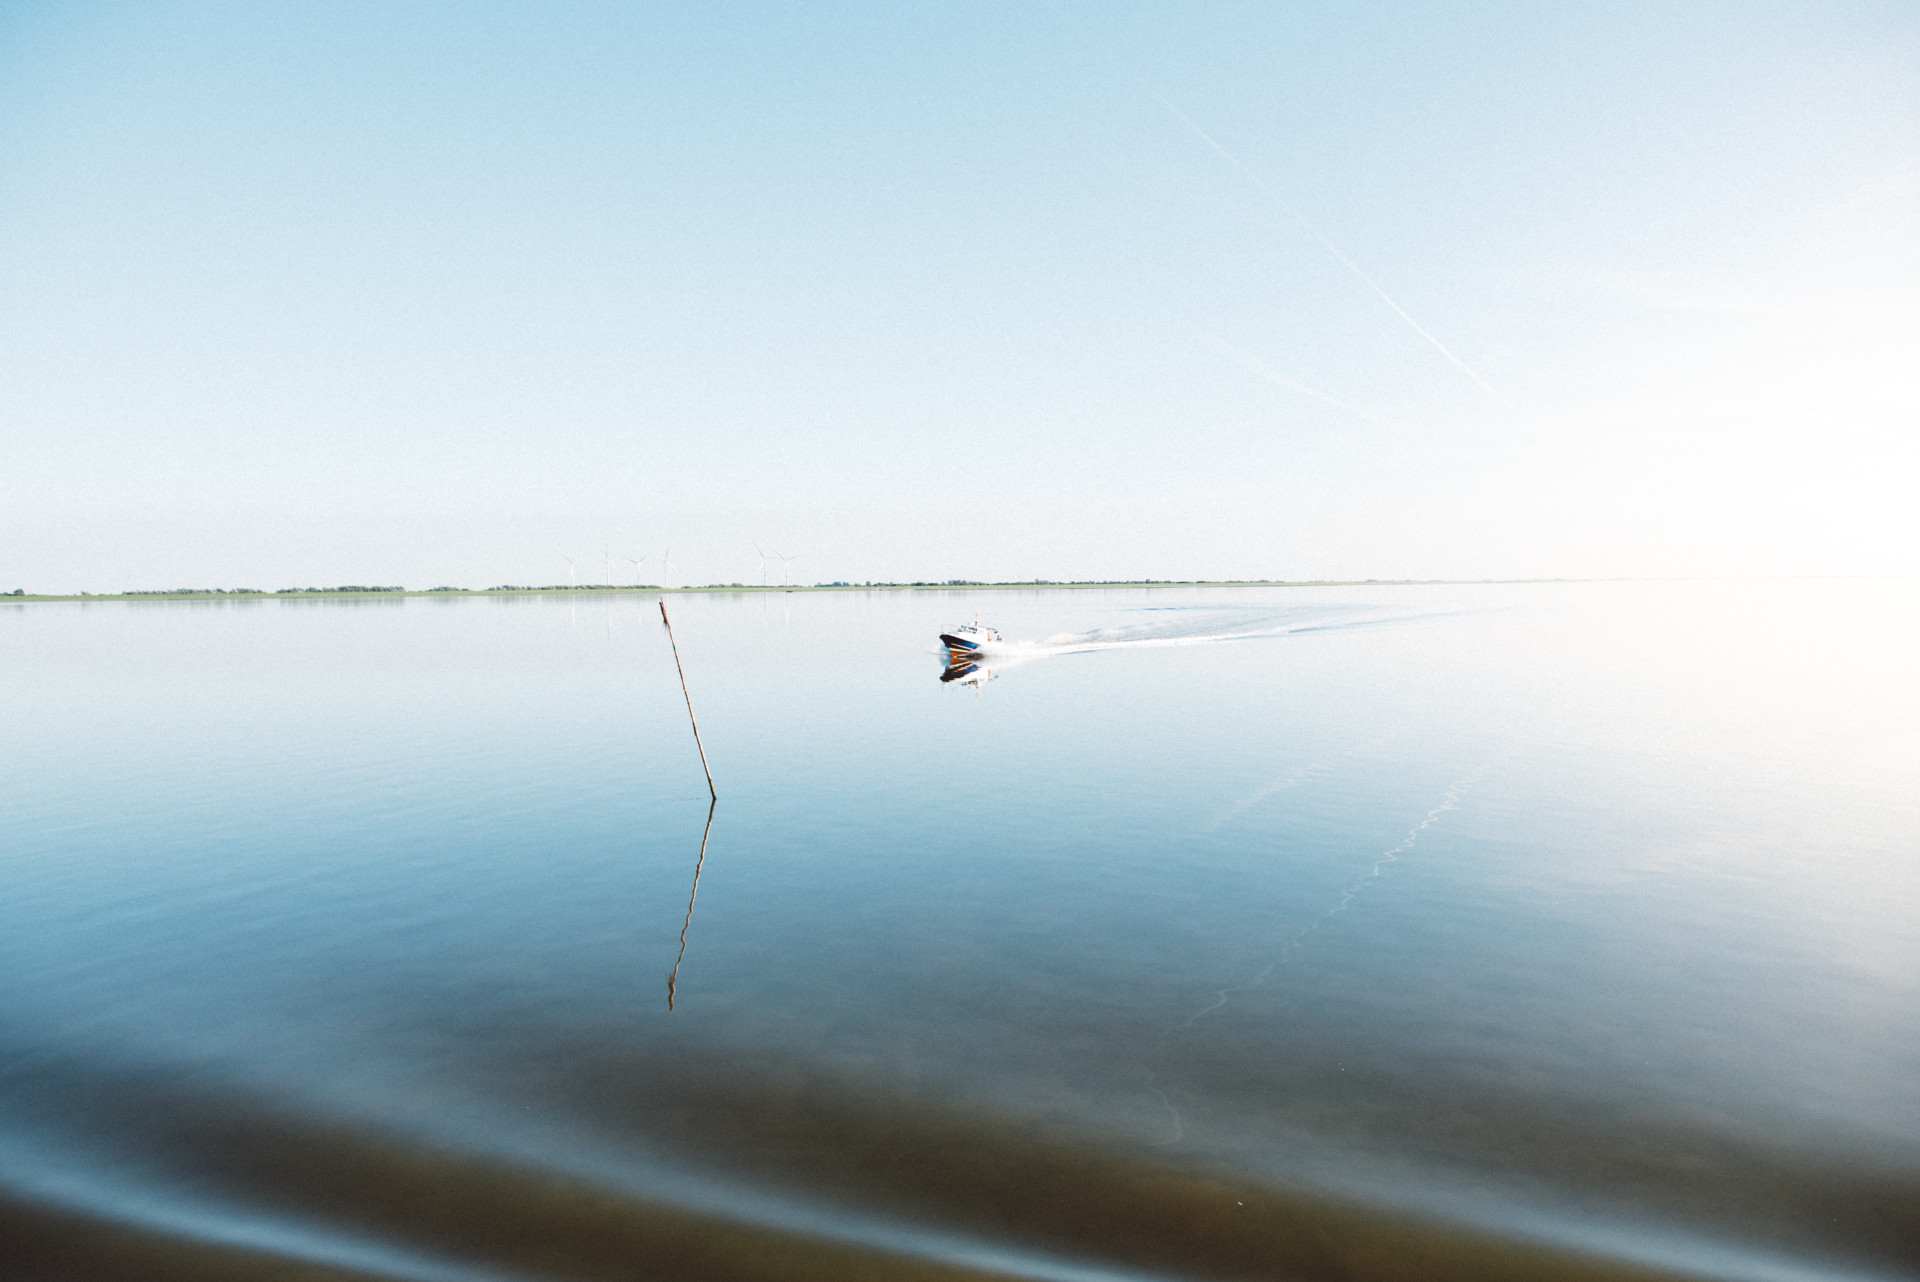 Weinbrandt. | Photographer RANDOM